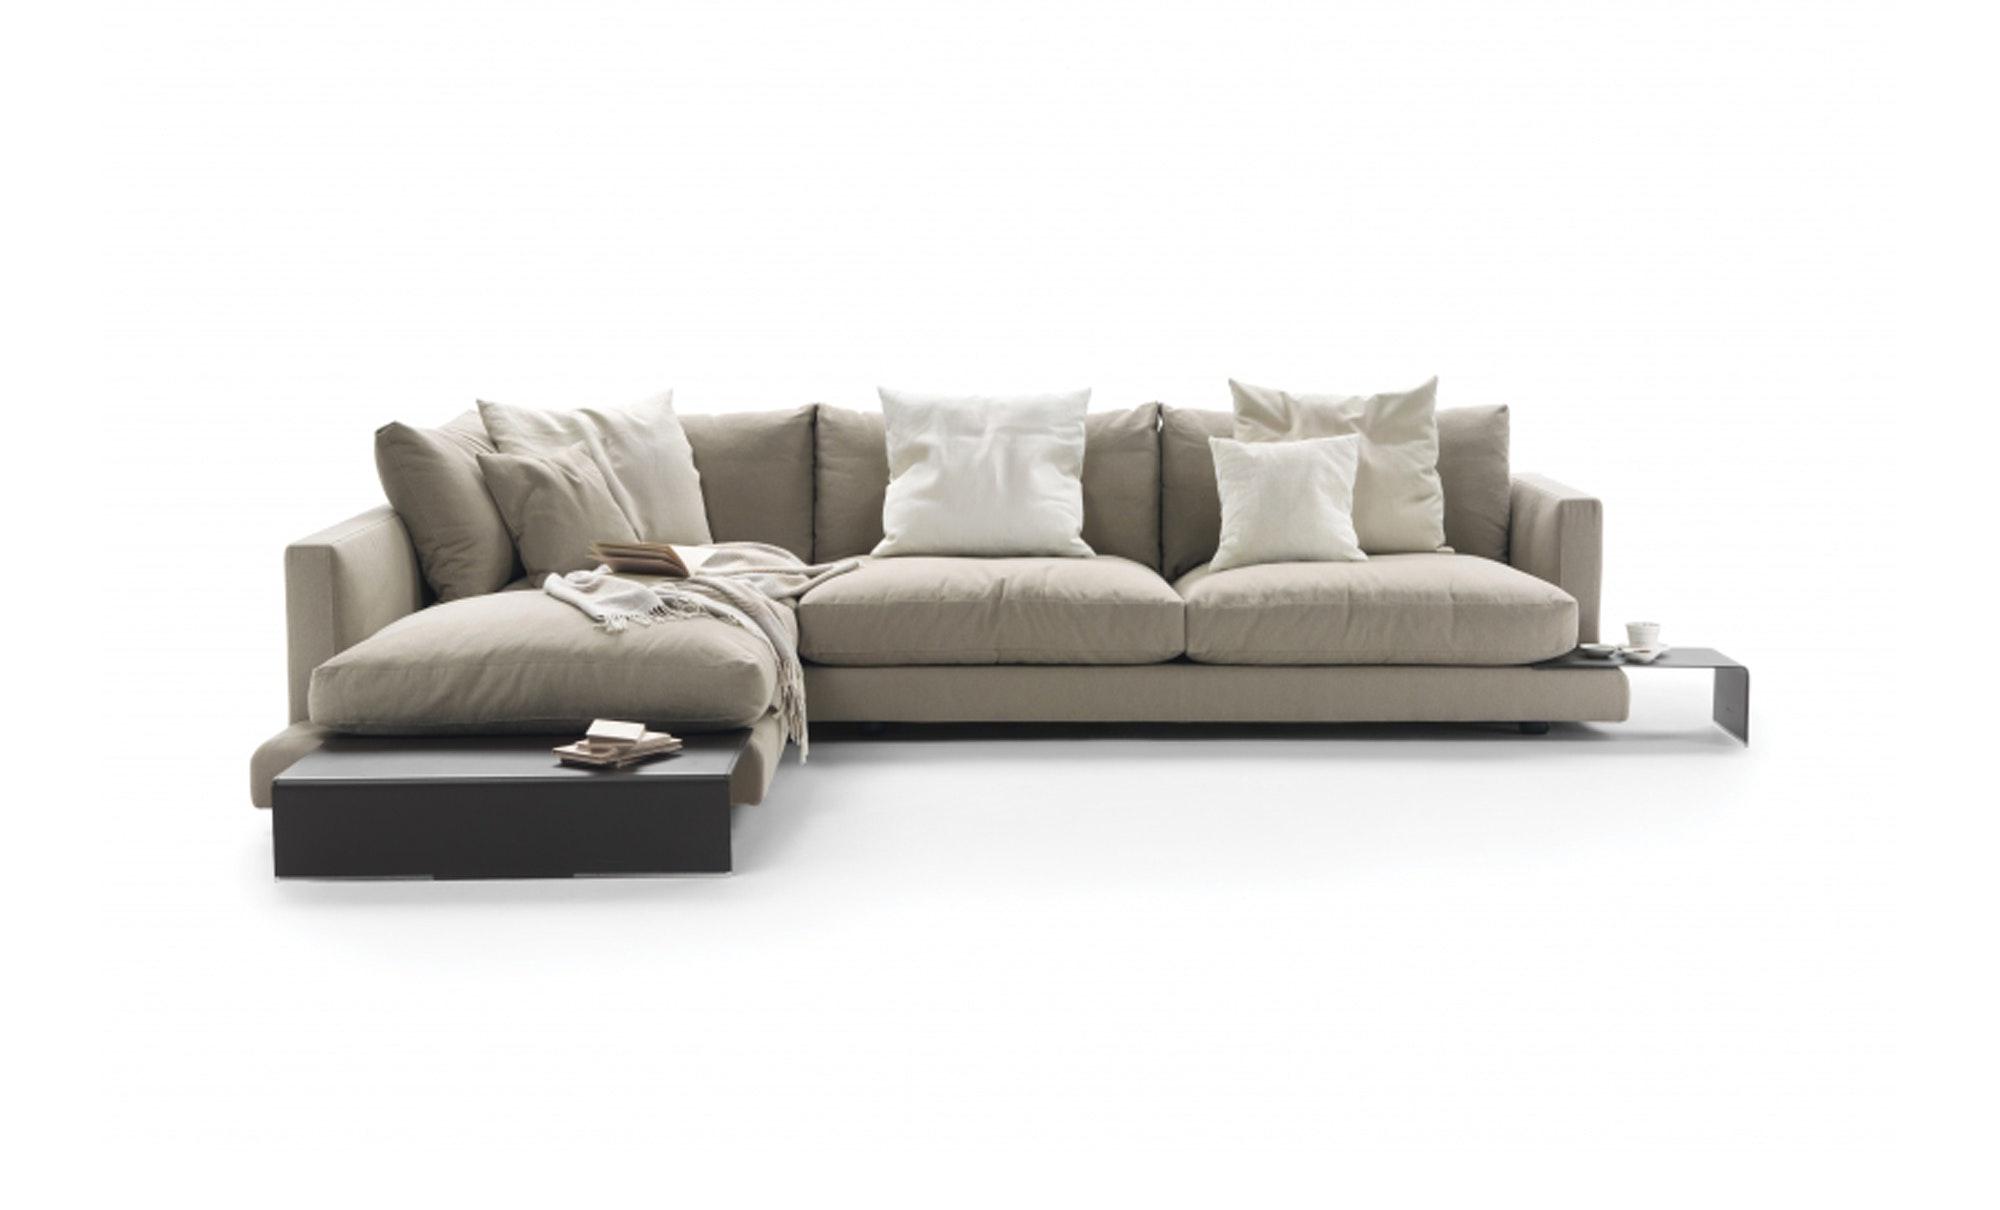 Fabulous Long Island Sofas Fanuli Furniture Interior Design Ideas Clesiryabchikinfo